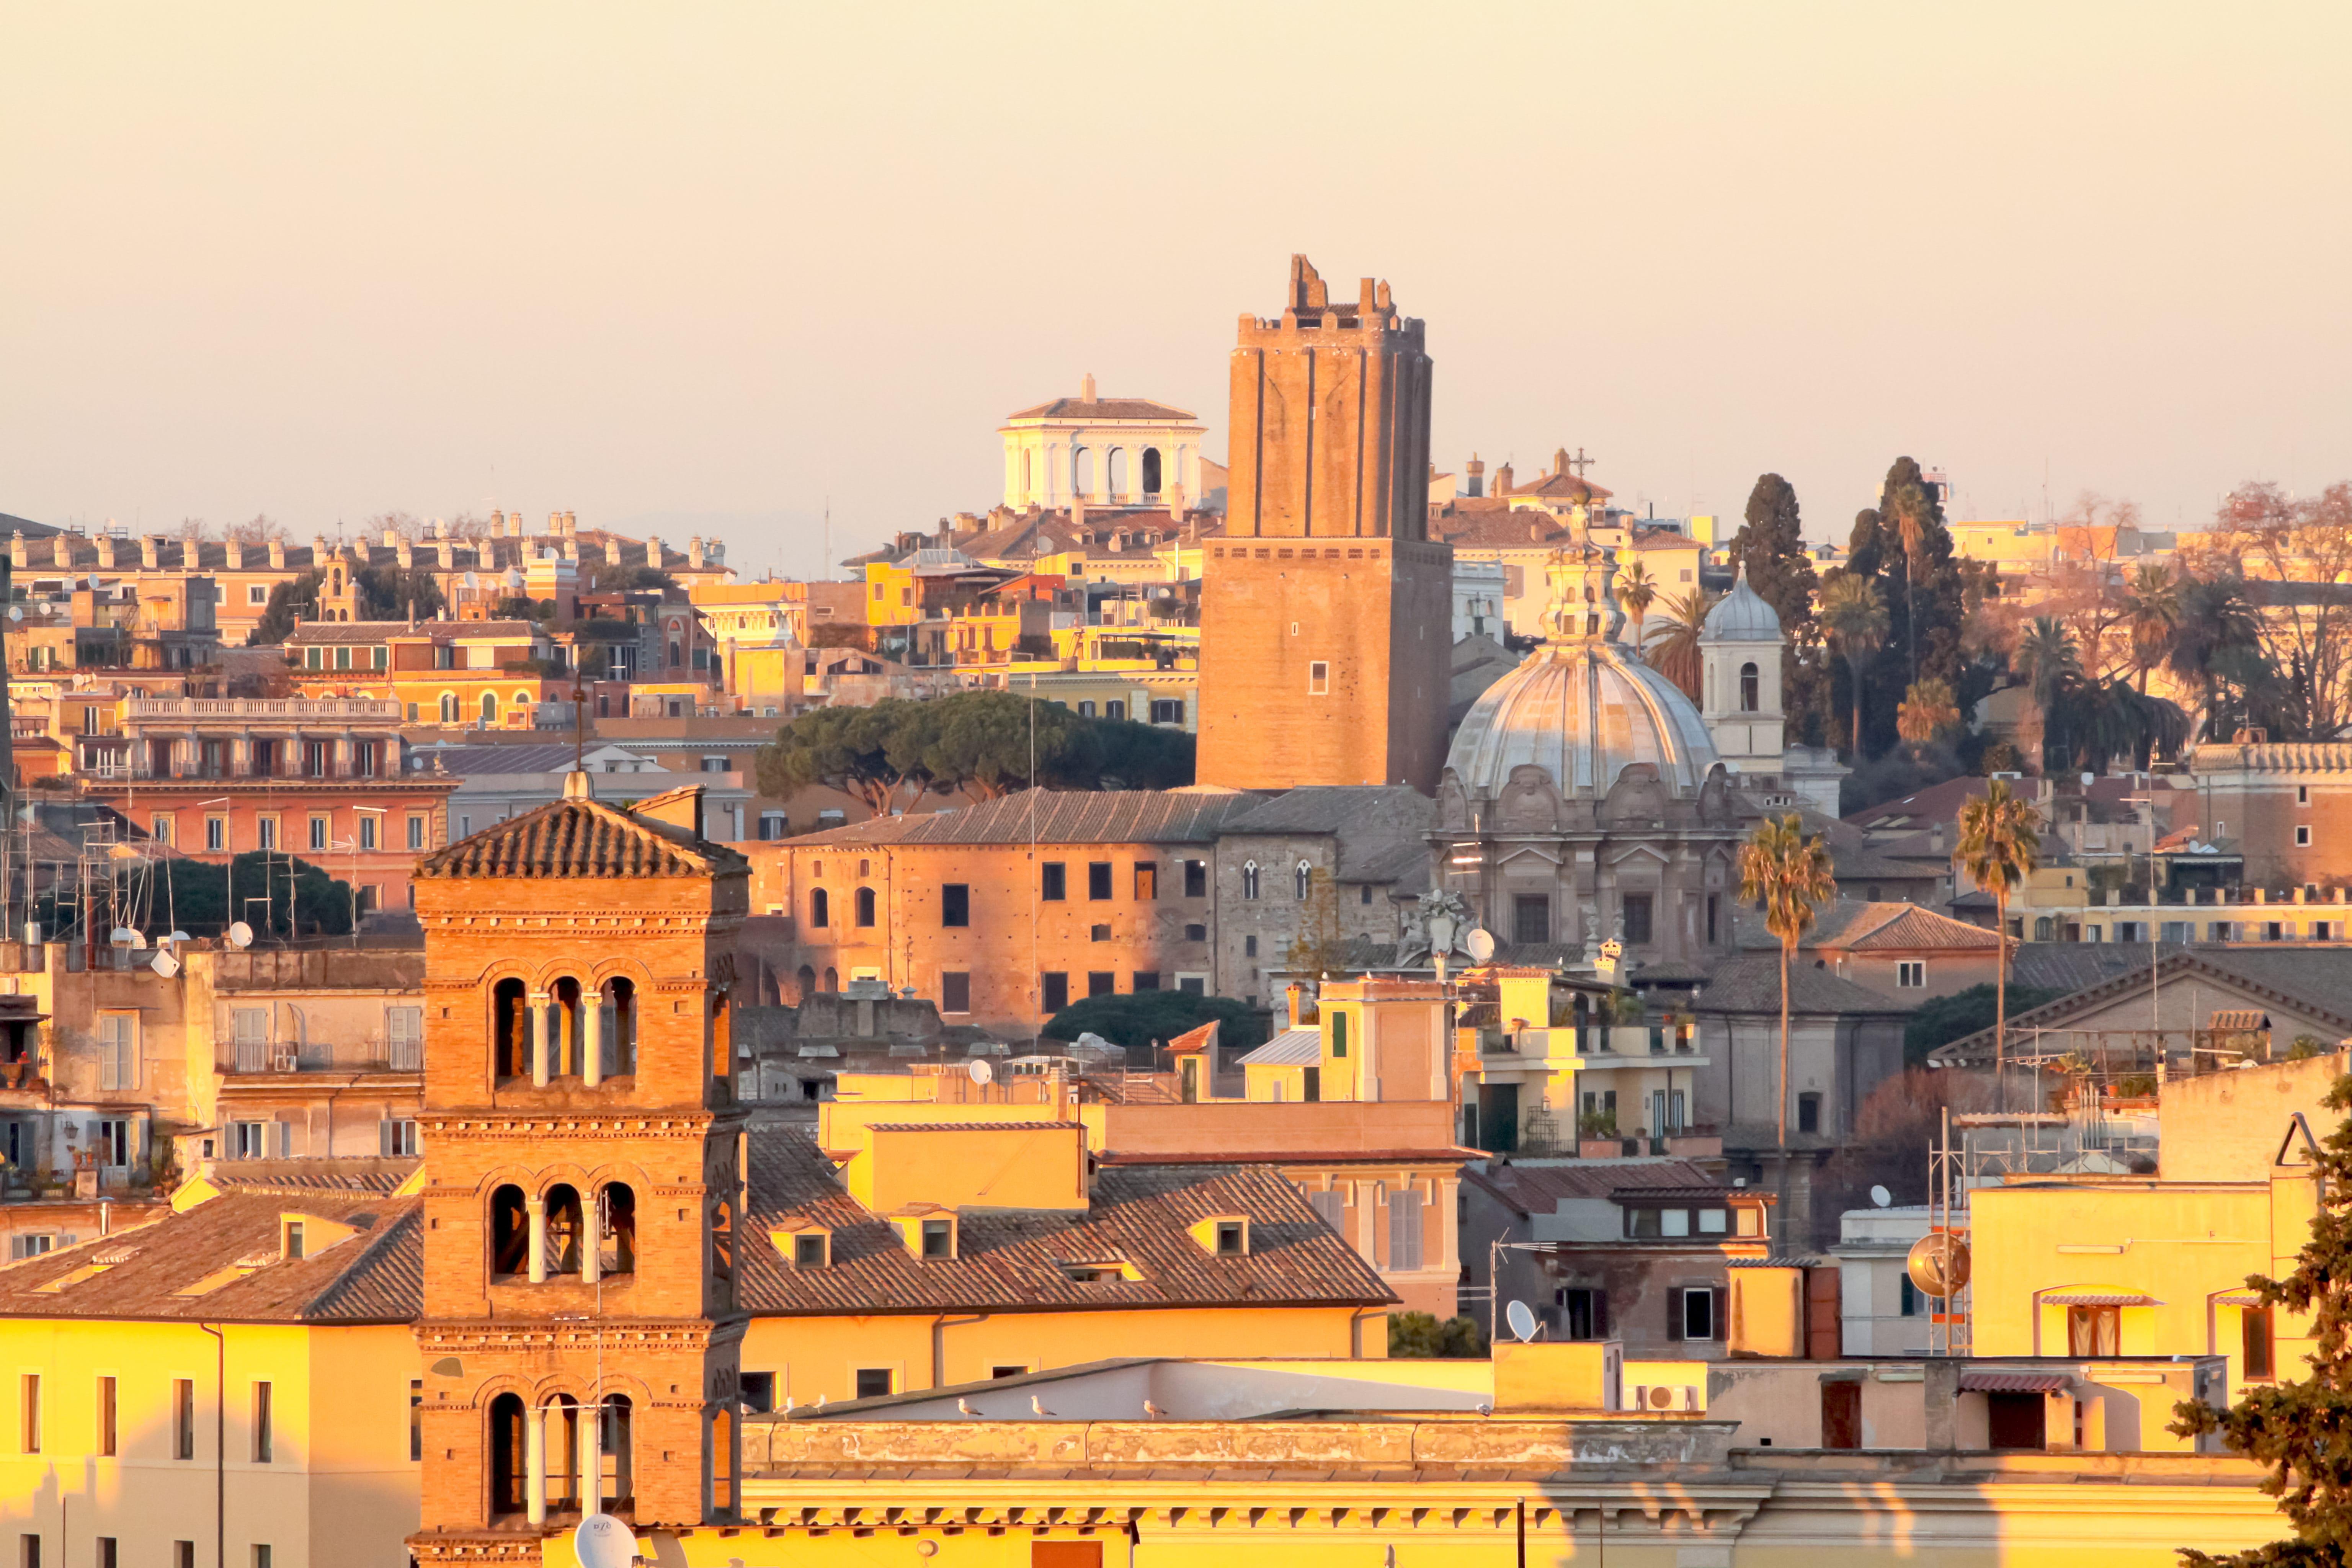 Torre Delle Milizie, Rome